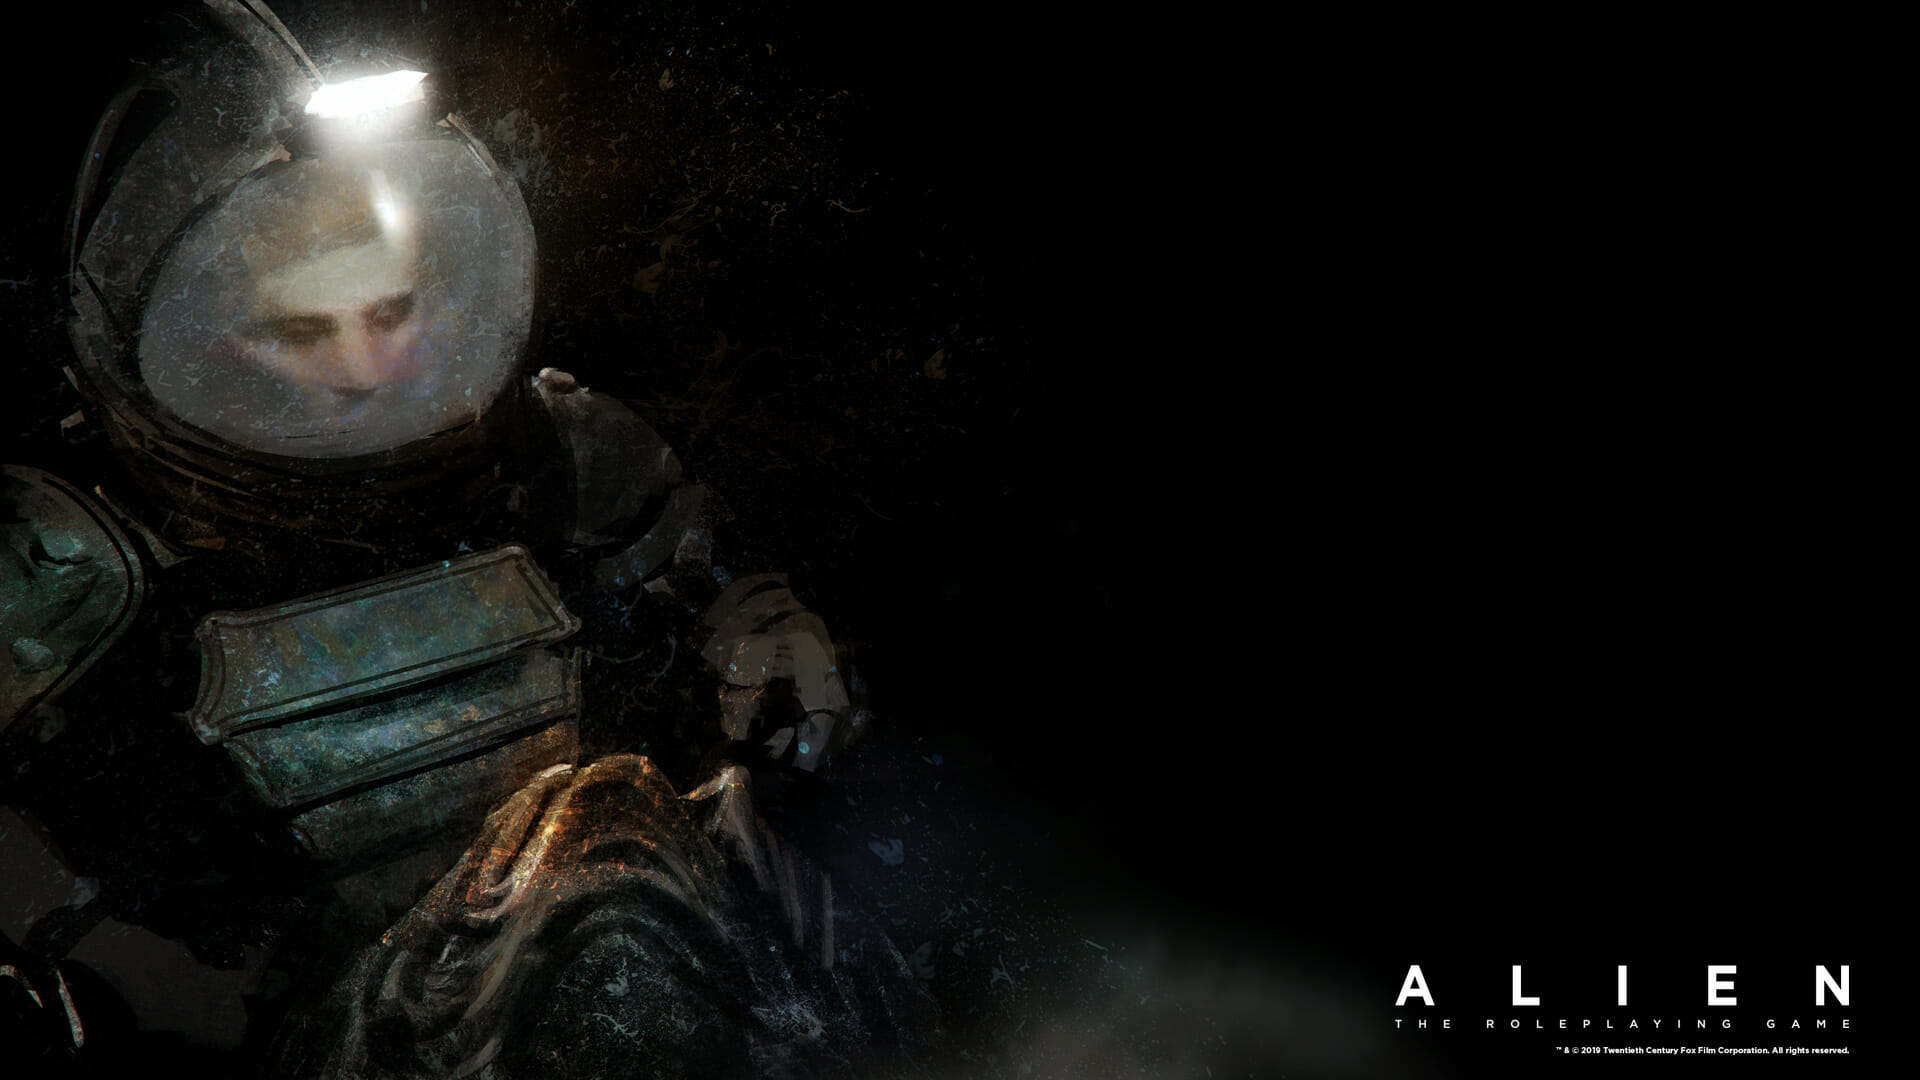 Free to Download: Alien RPG goodies